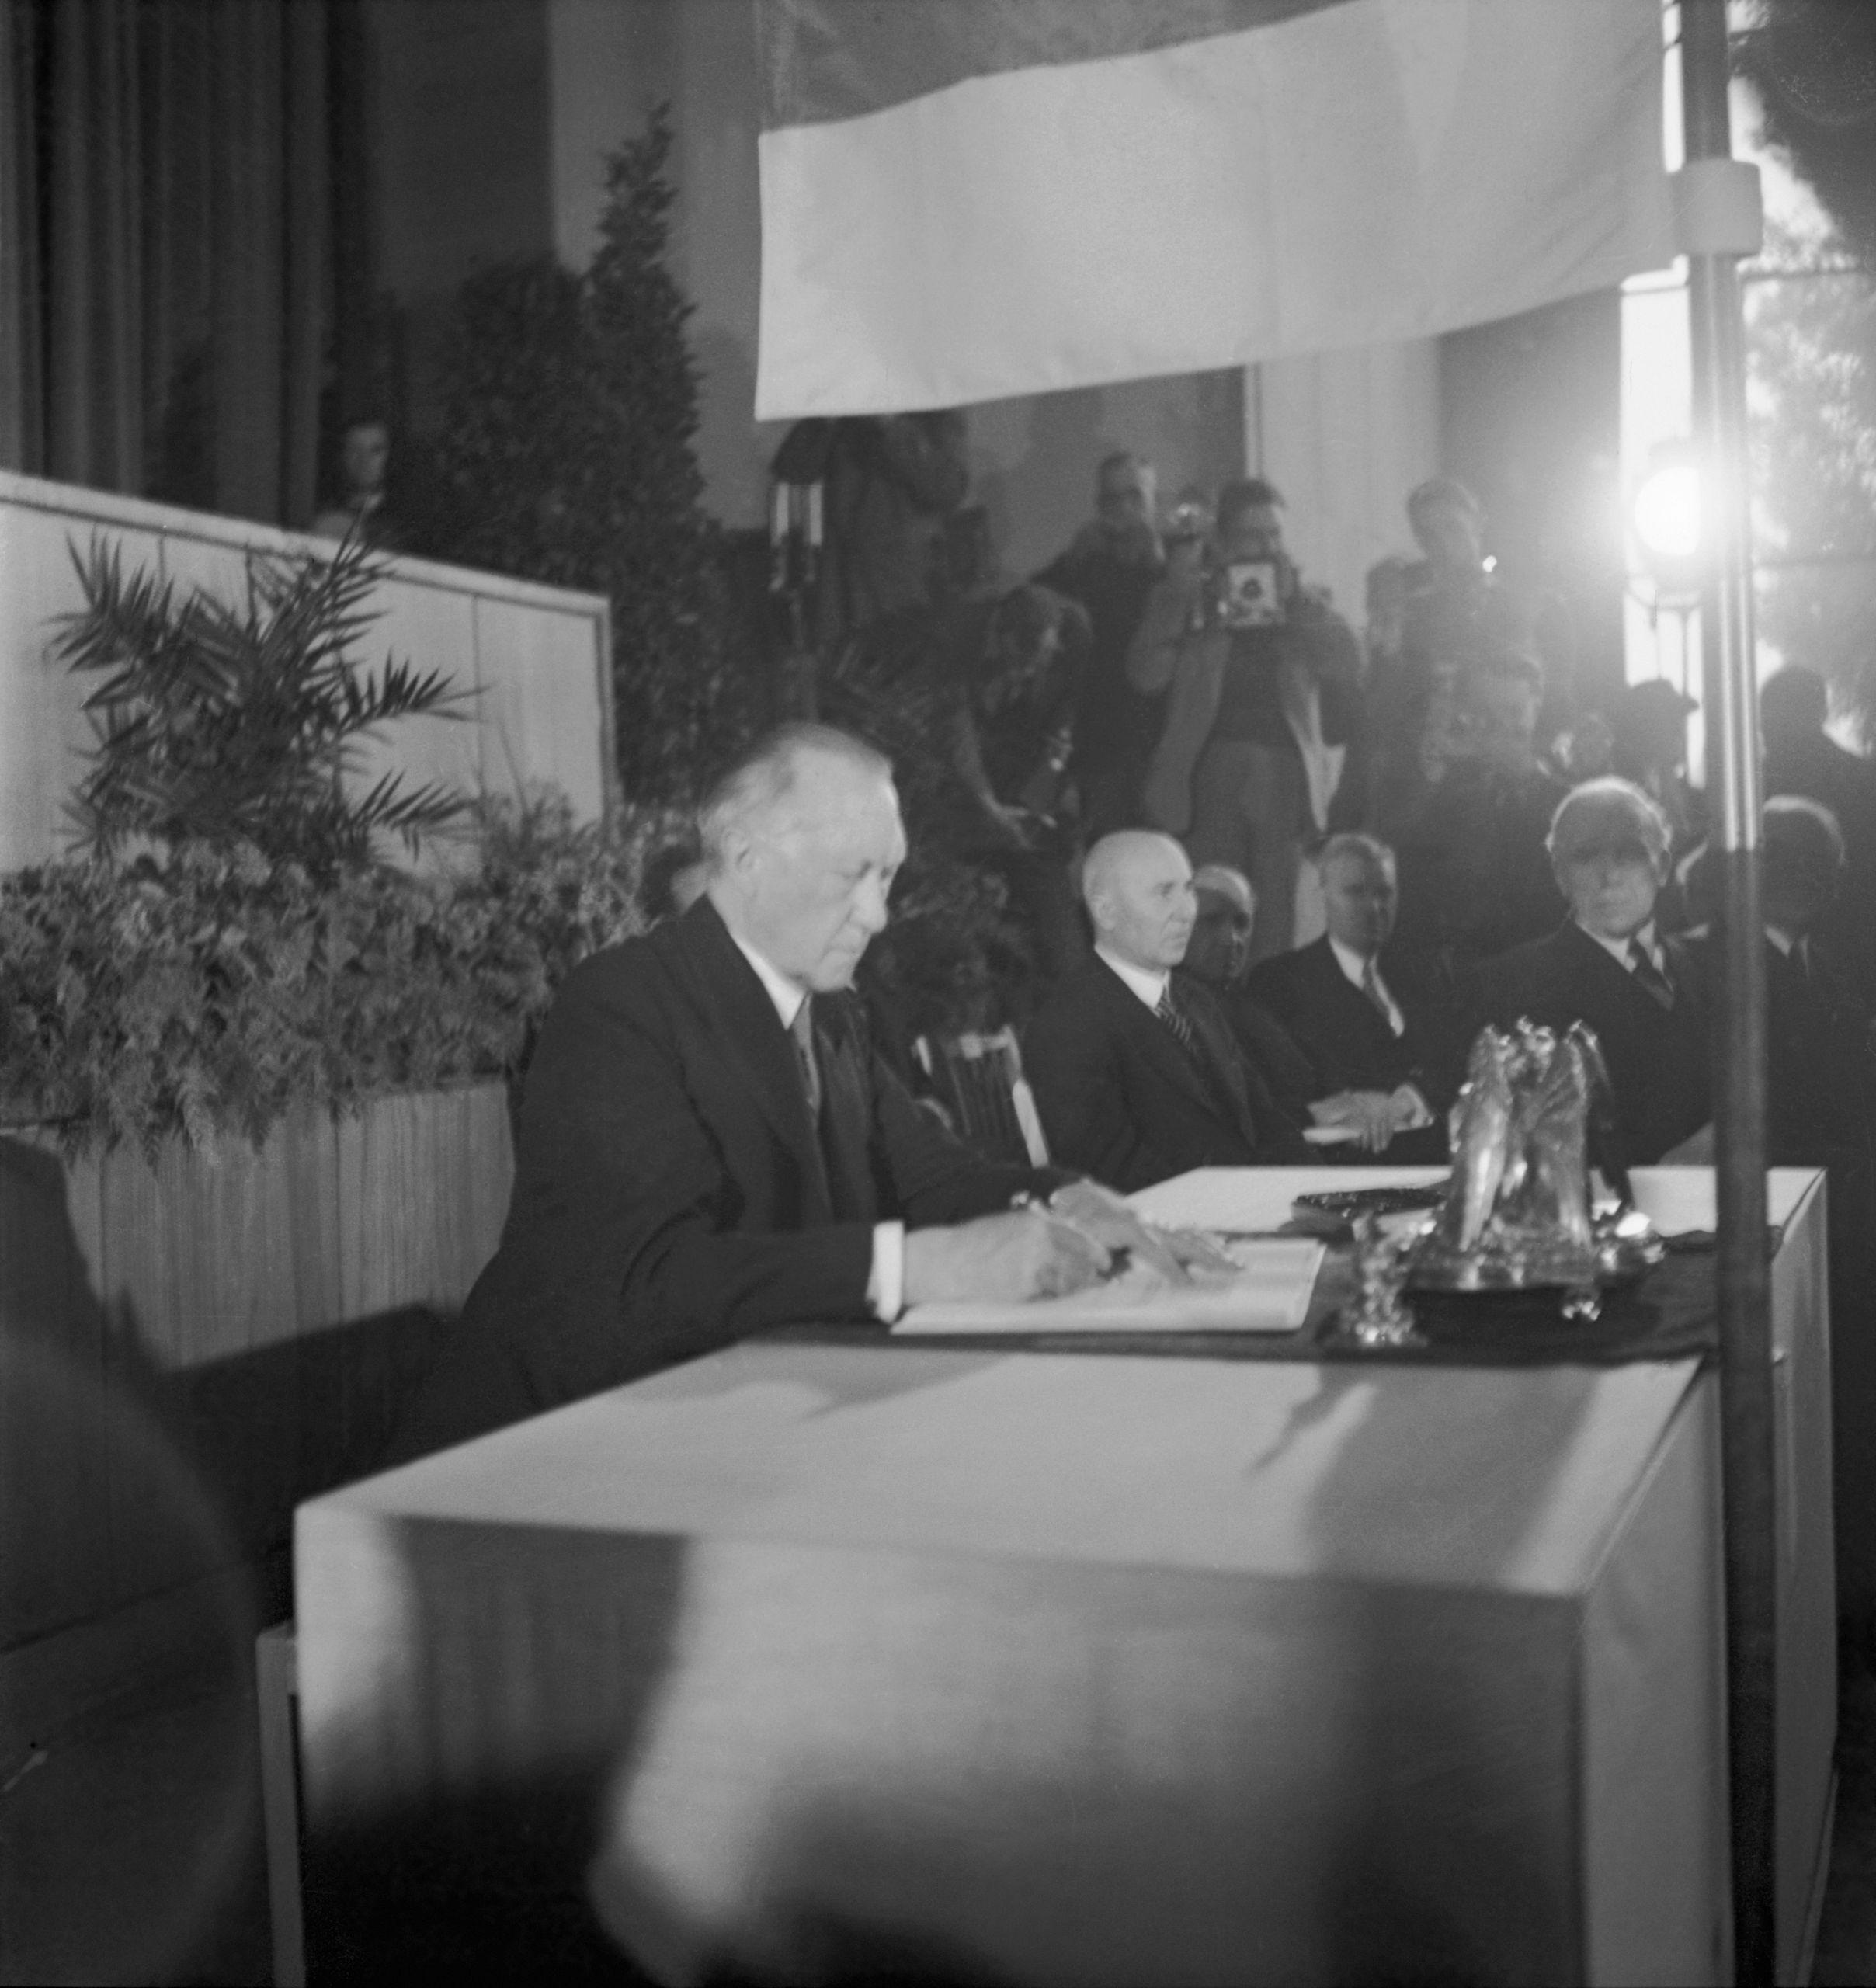 Credit Bestand Erna Wagner Hehmke Haus der Geschichte Bonn Bilddaten dürfen nicht beschnitten od